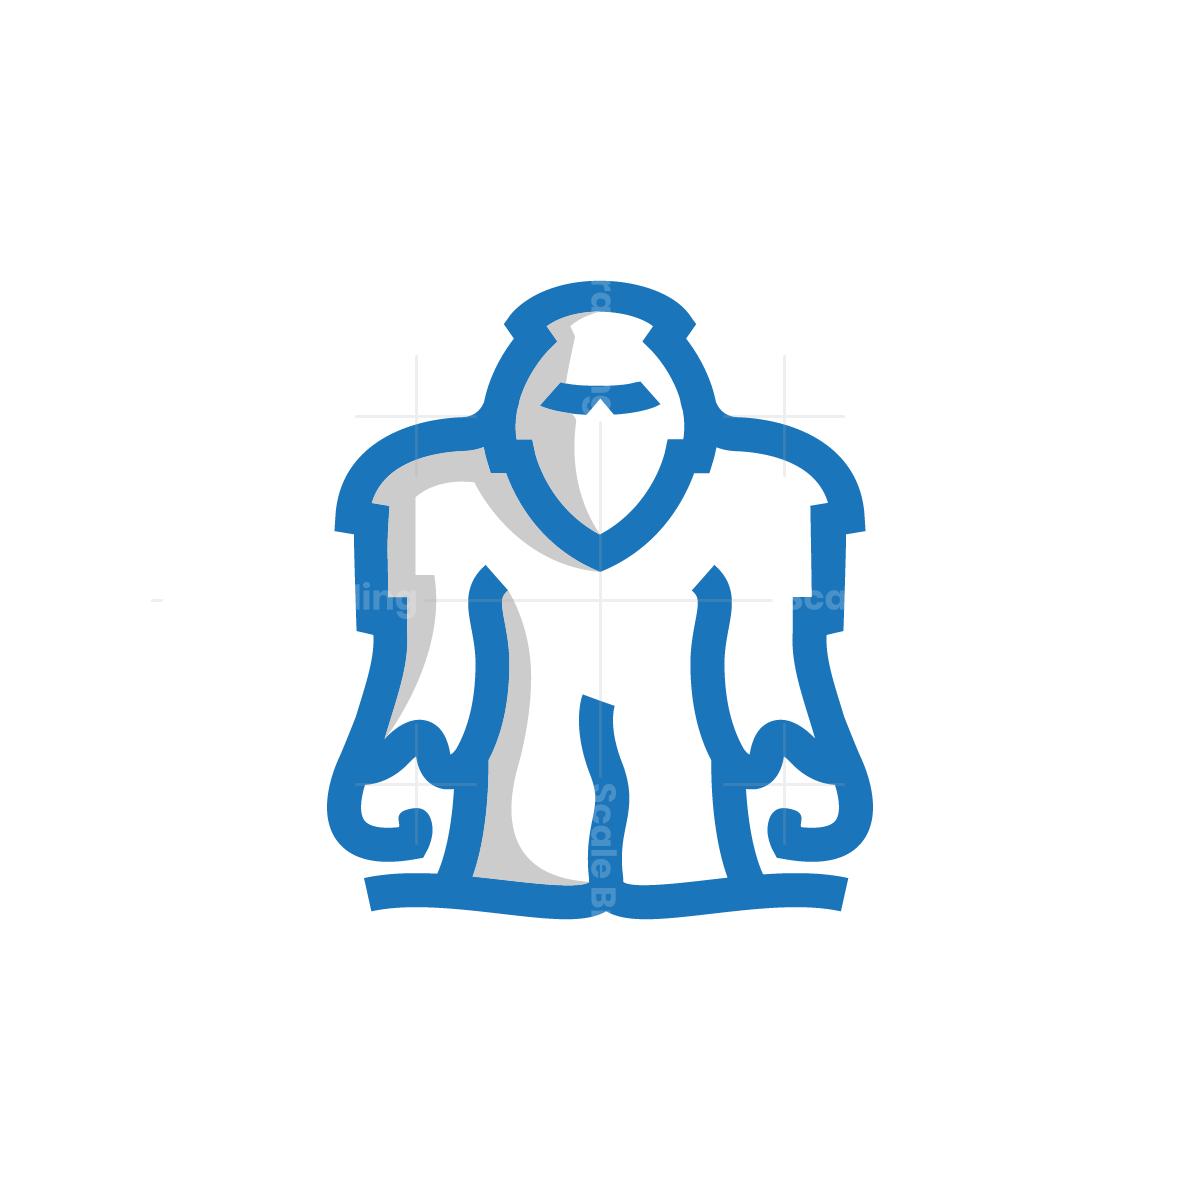 Yeti Logo Yeti Logo Logos Yeti